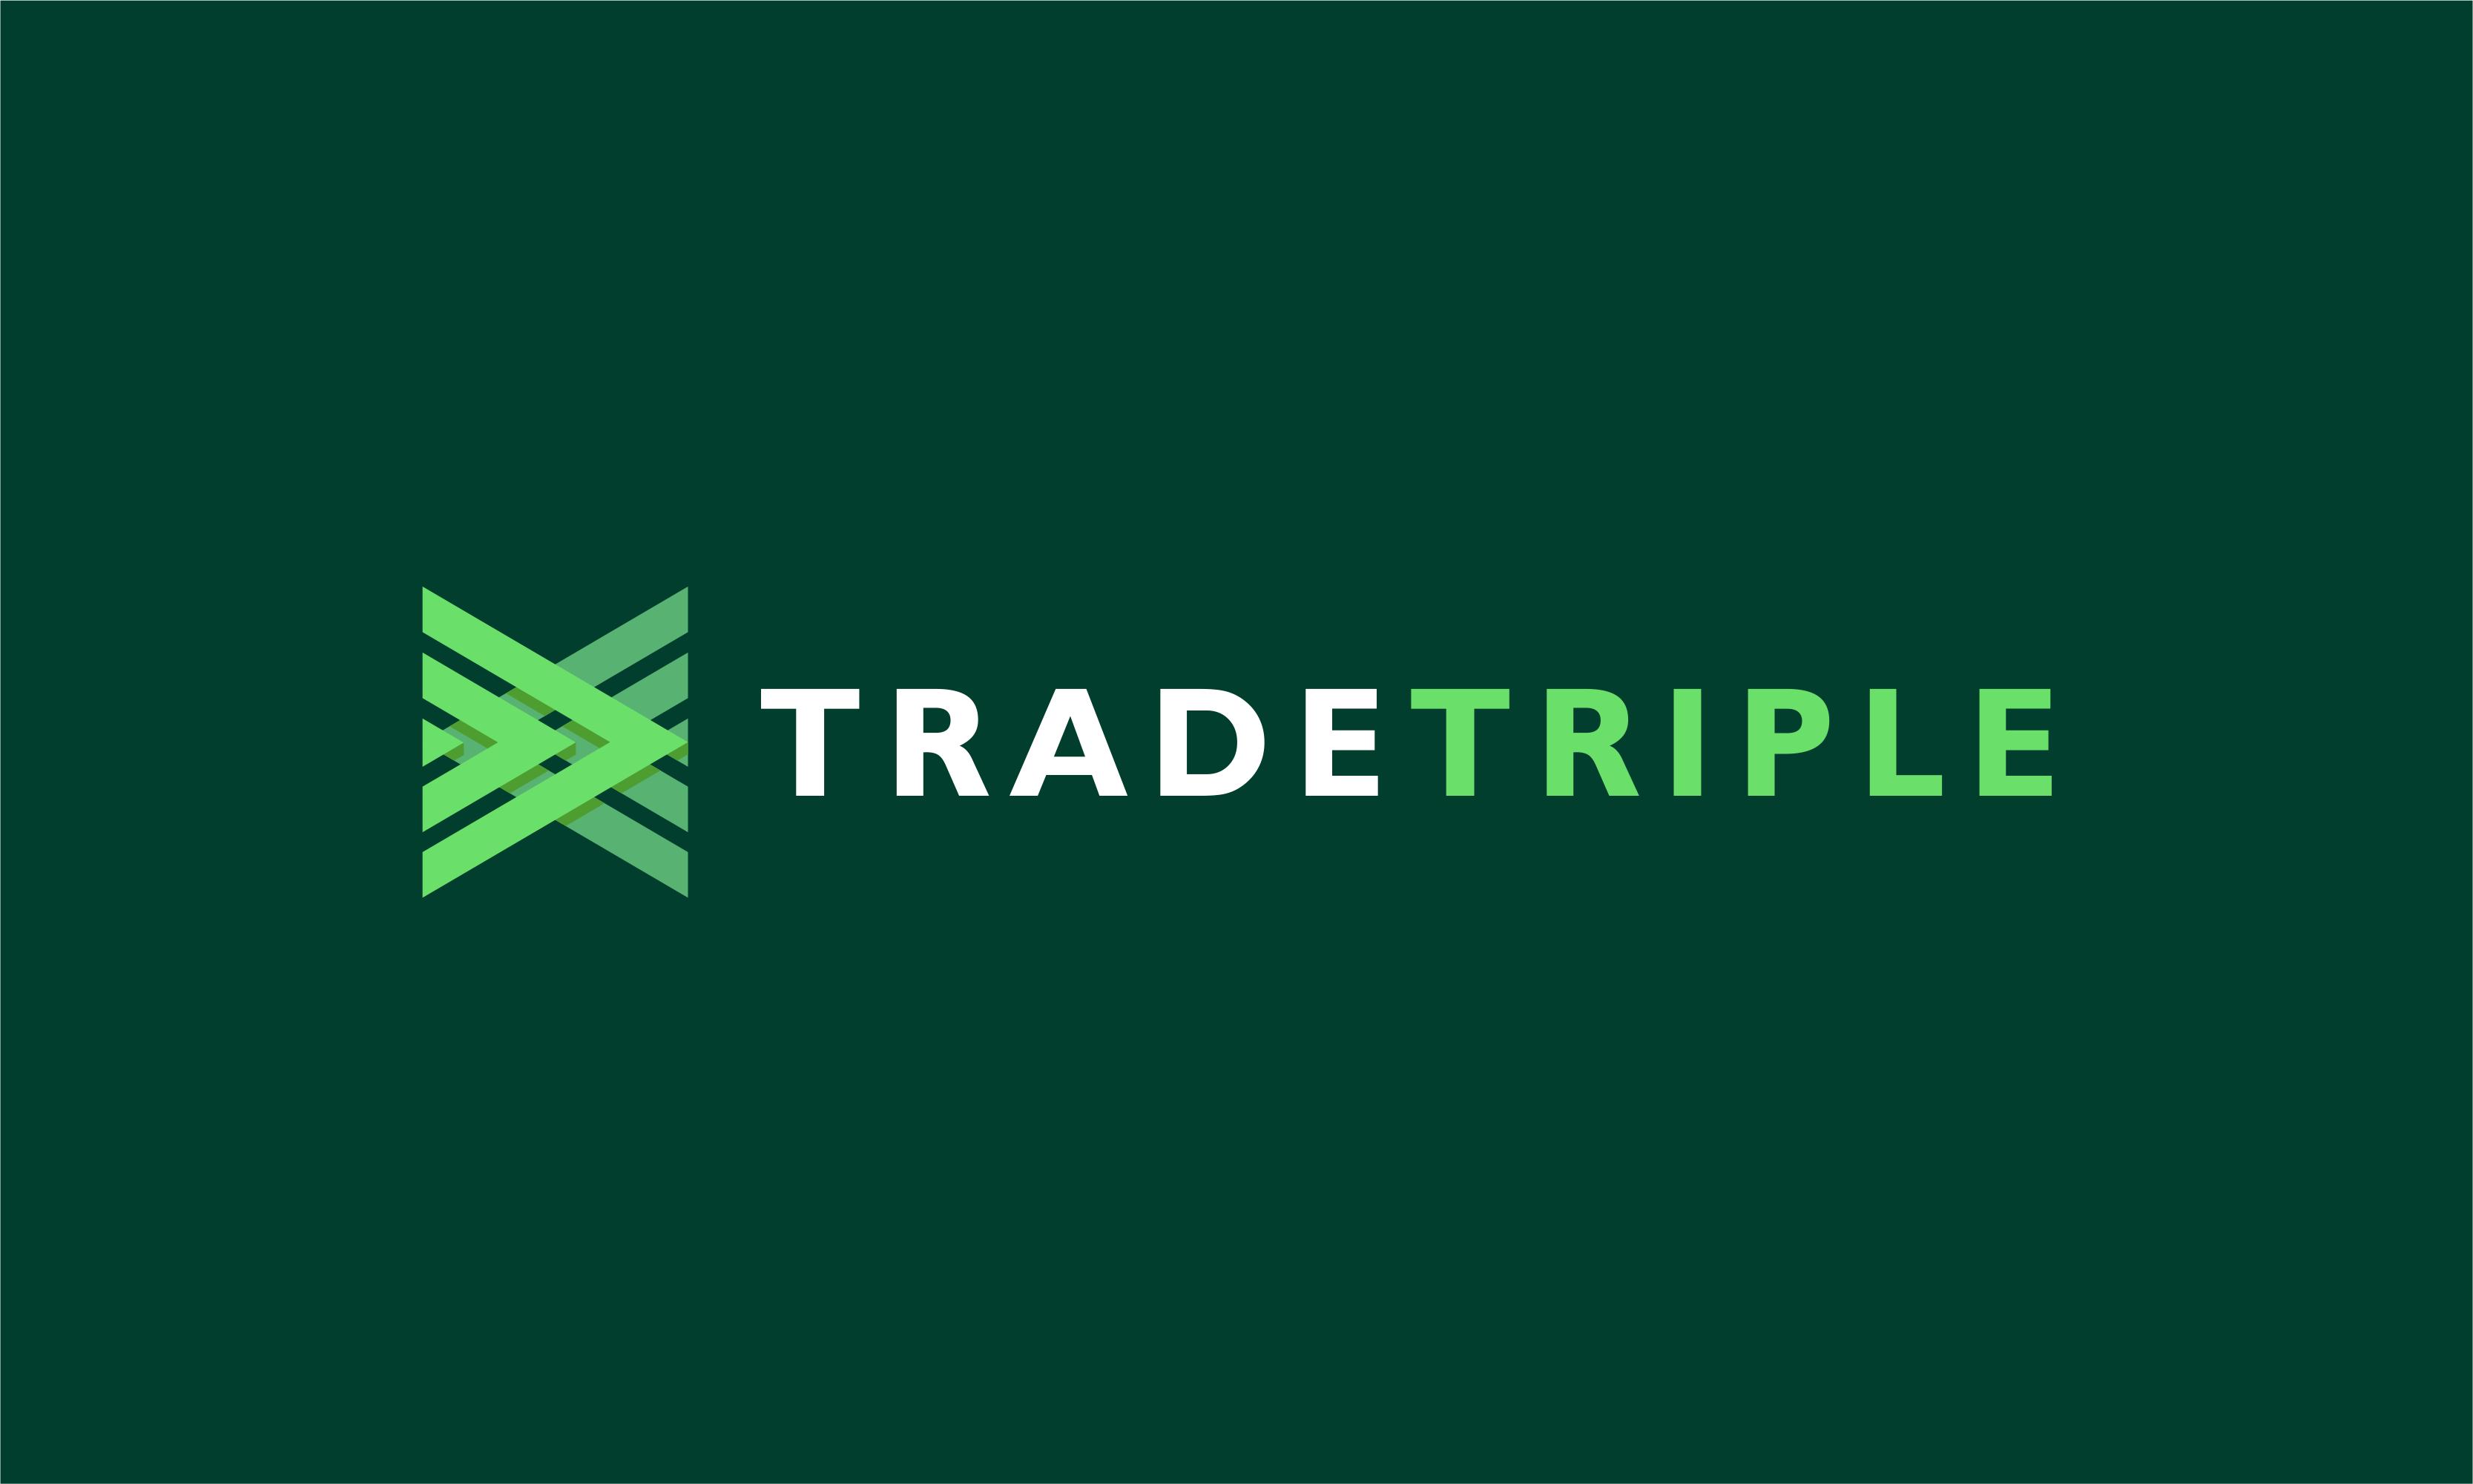 Tradetriple